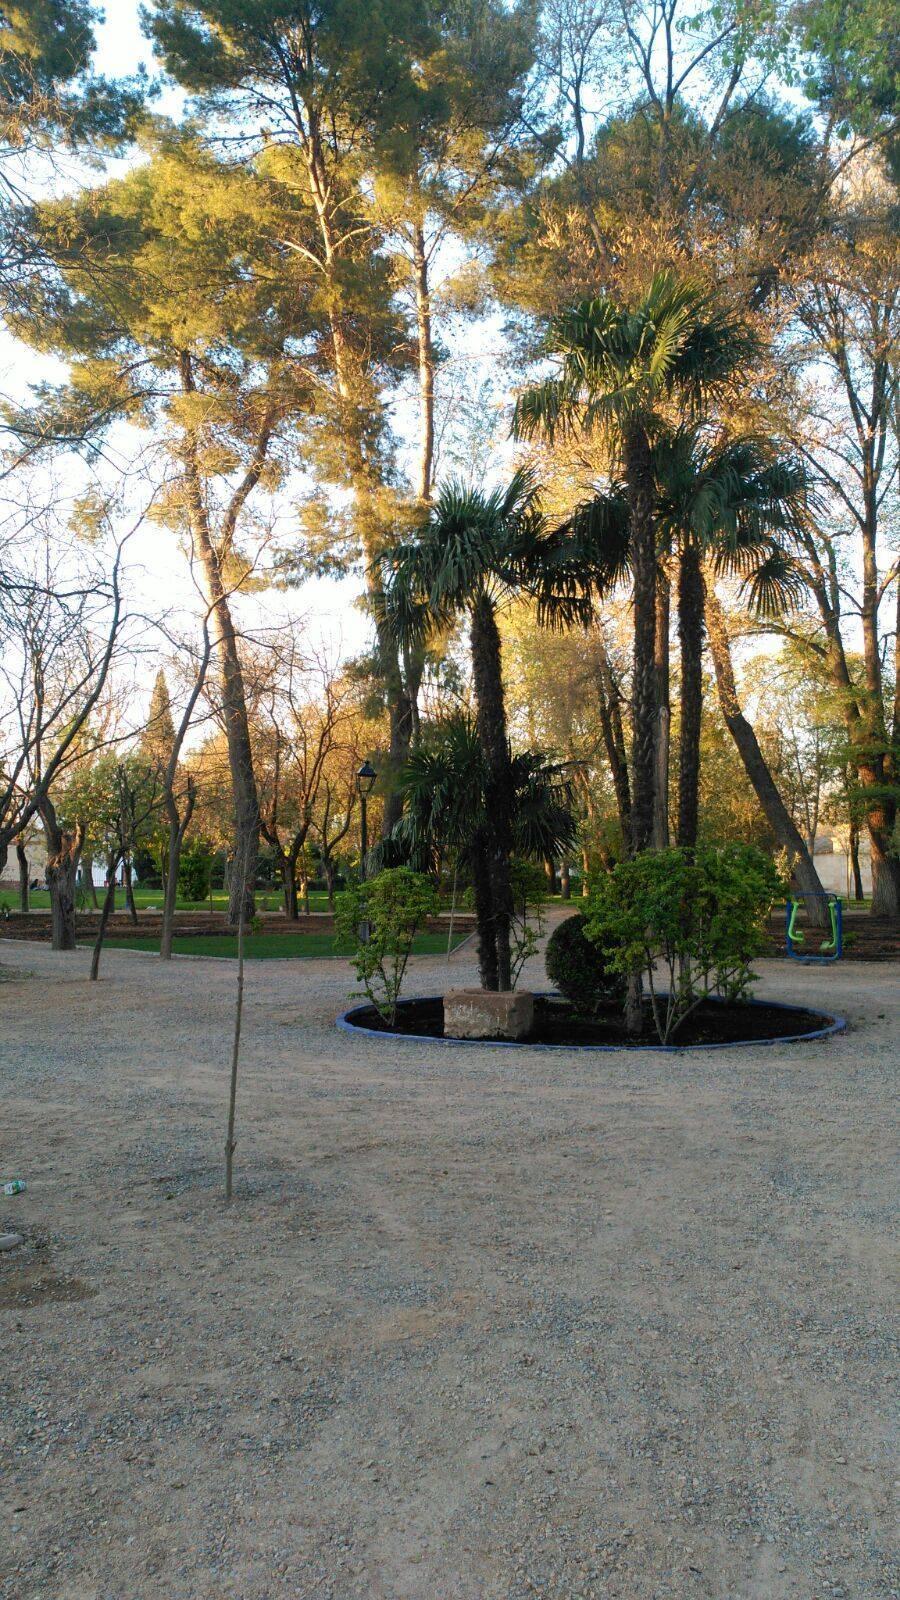 obras parque municipal casi acabadas herencia 1 - Las obras de renovación del Parque Municipal casi acabadas